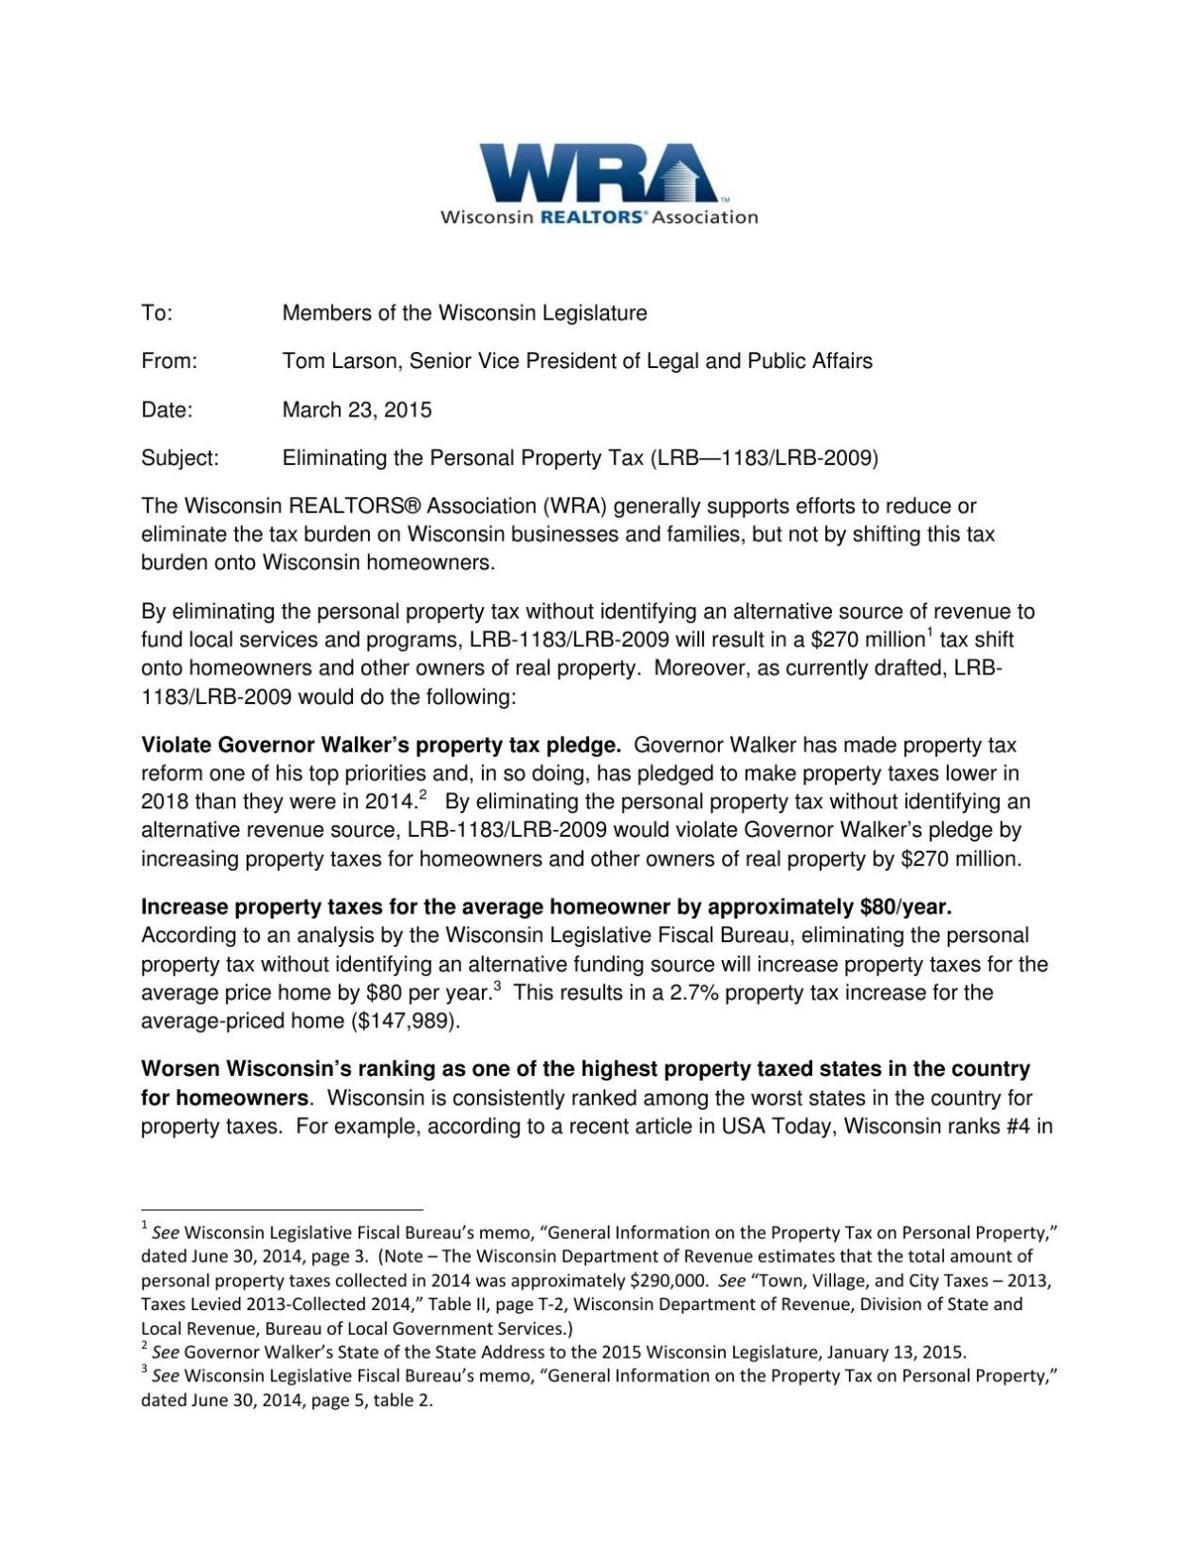 Realtors letter opposing tax shift